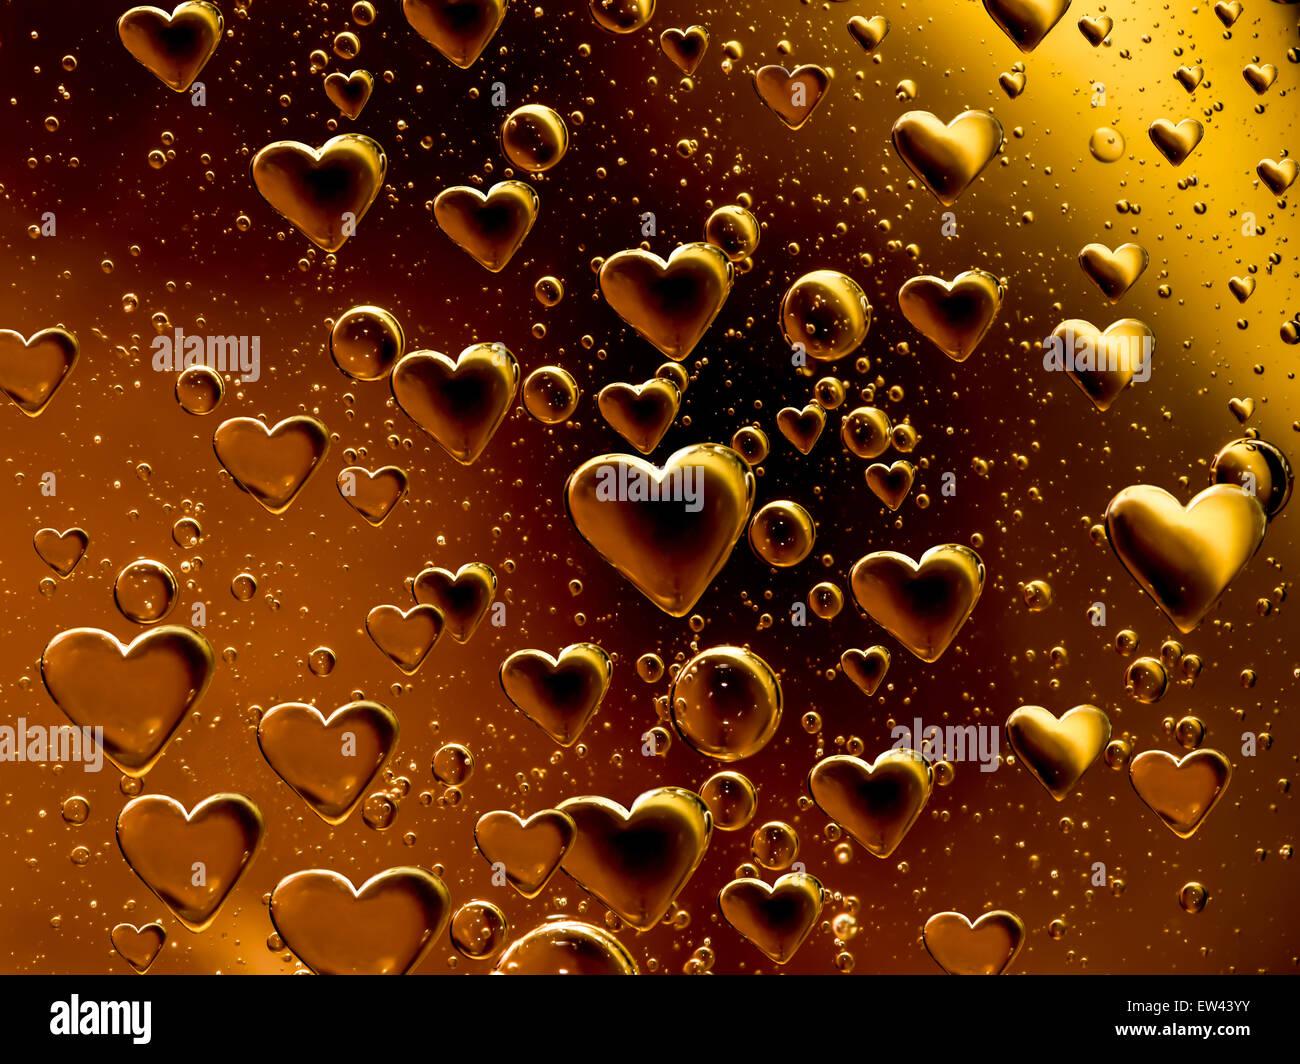 Orange air bubbles shaped like hearts - Stock Image